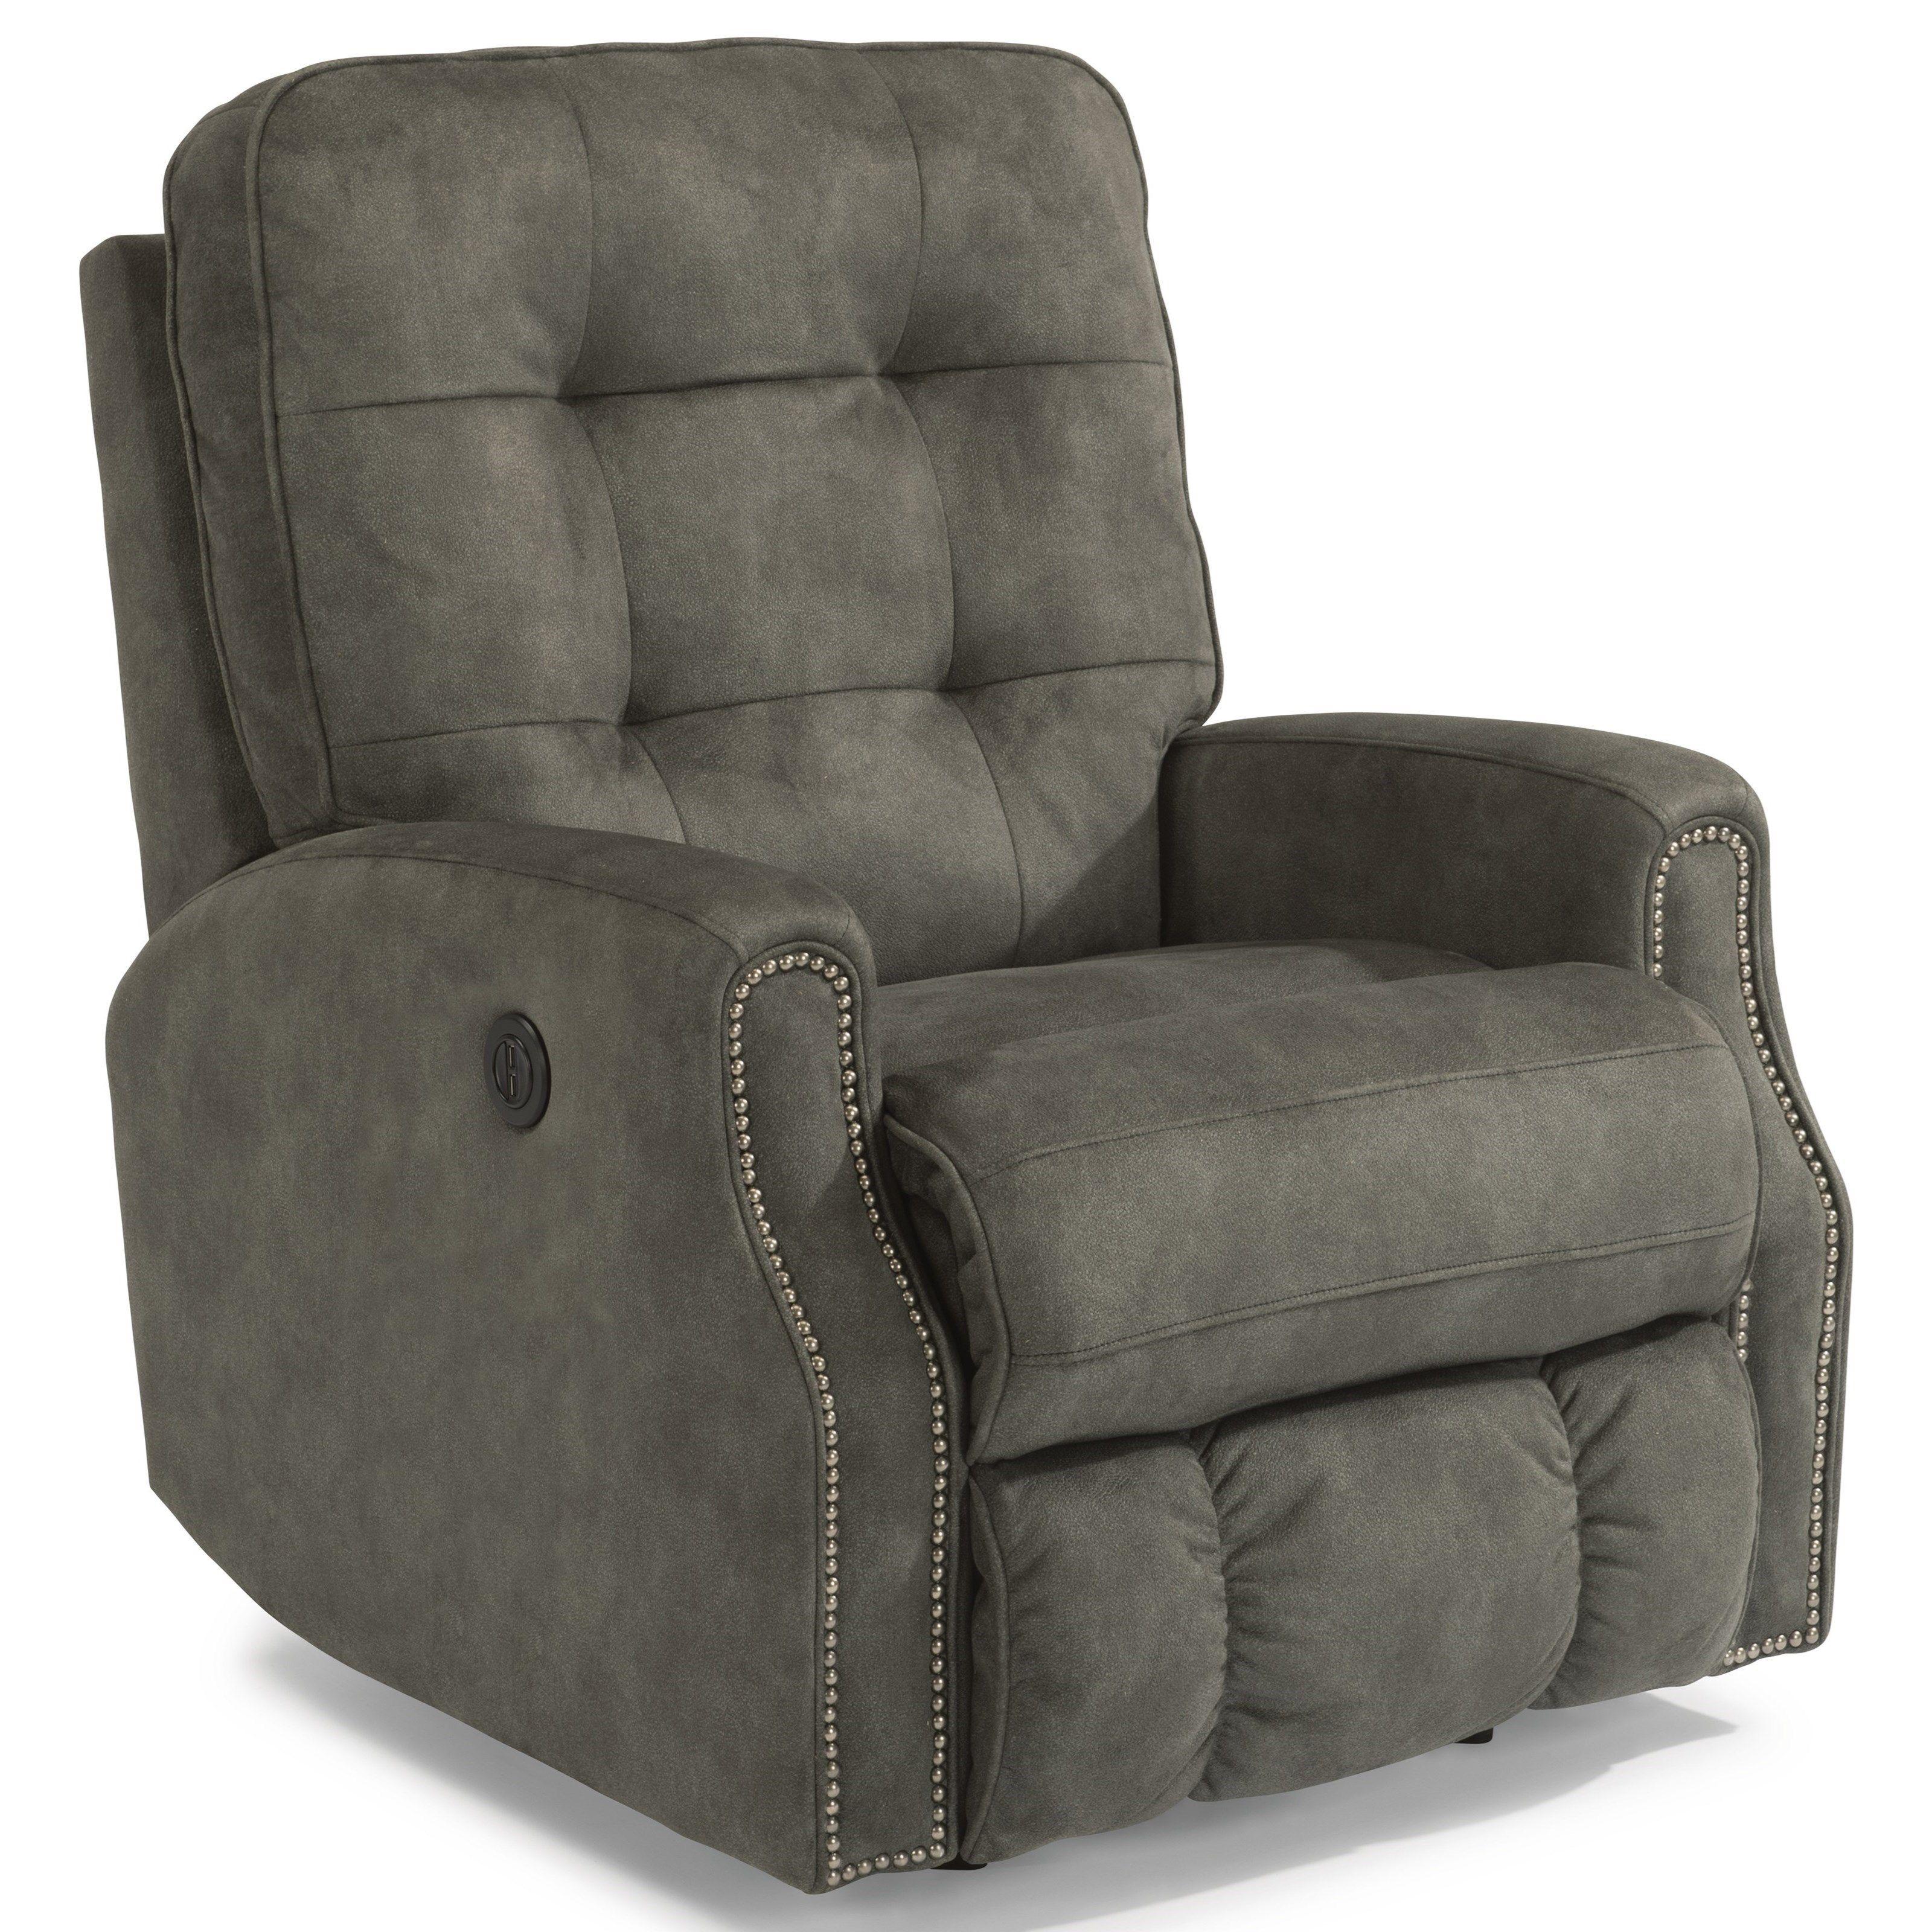 Devon Power Rocker Recliner W/ Nailheadsflexsteel | Furniture Within Devon Ii Swivel Accent Chairs (Image 6 of 20)